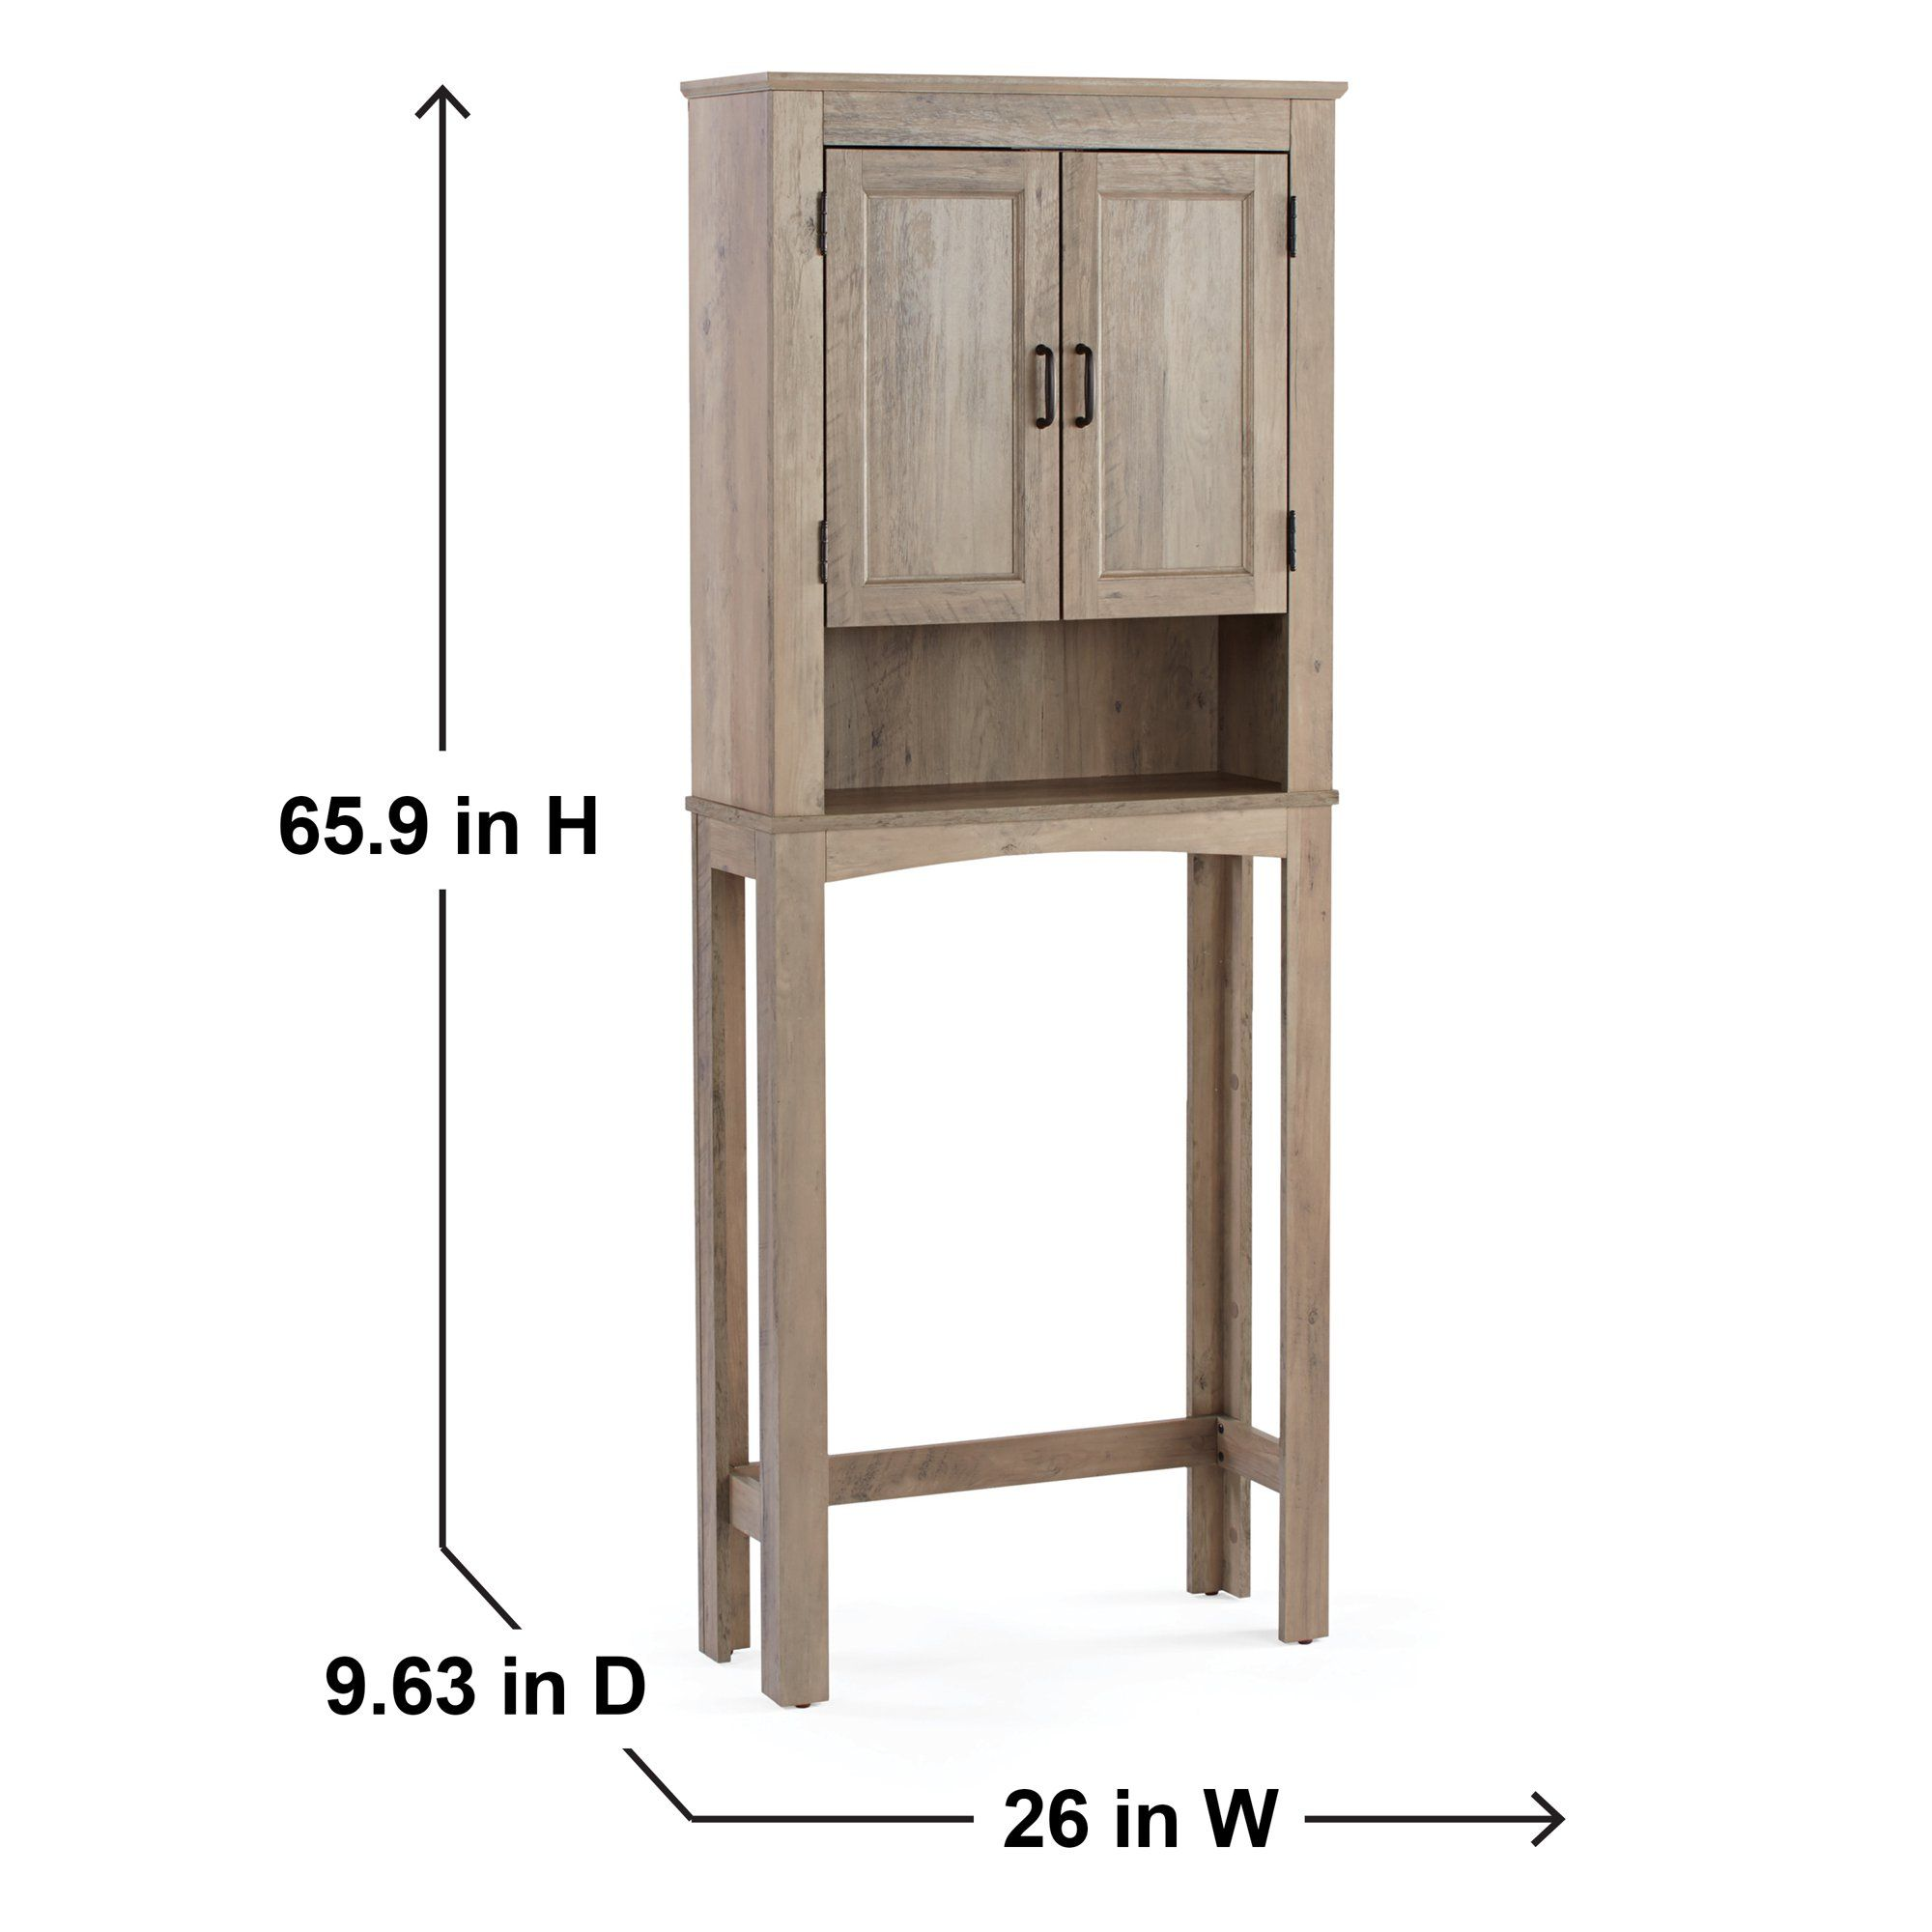 809e5f5f6de95b598424a5268588a4d0 - Better Homes And Gardens Over The Toilet Bathroom Space Saver